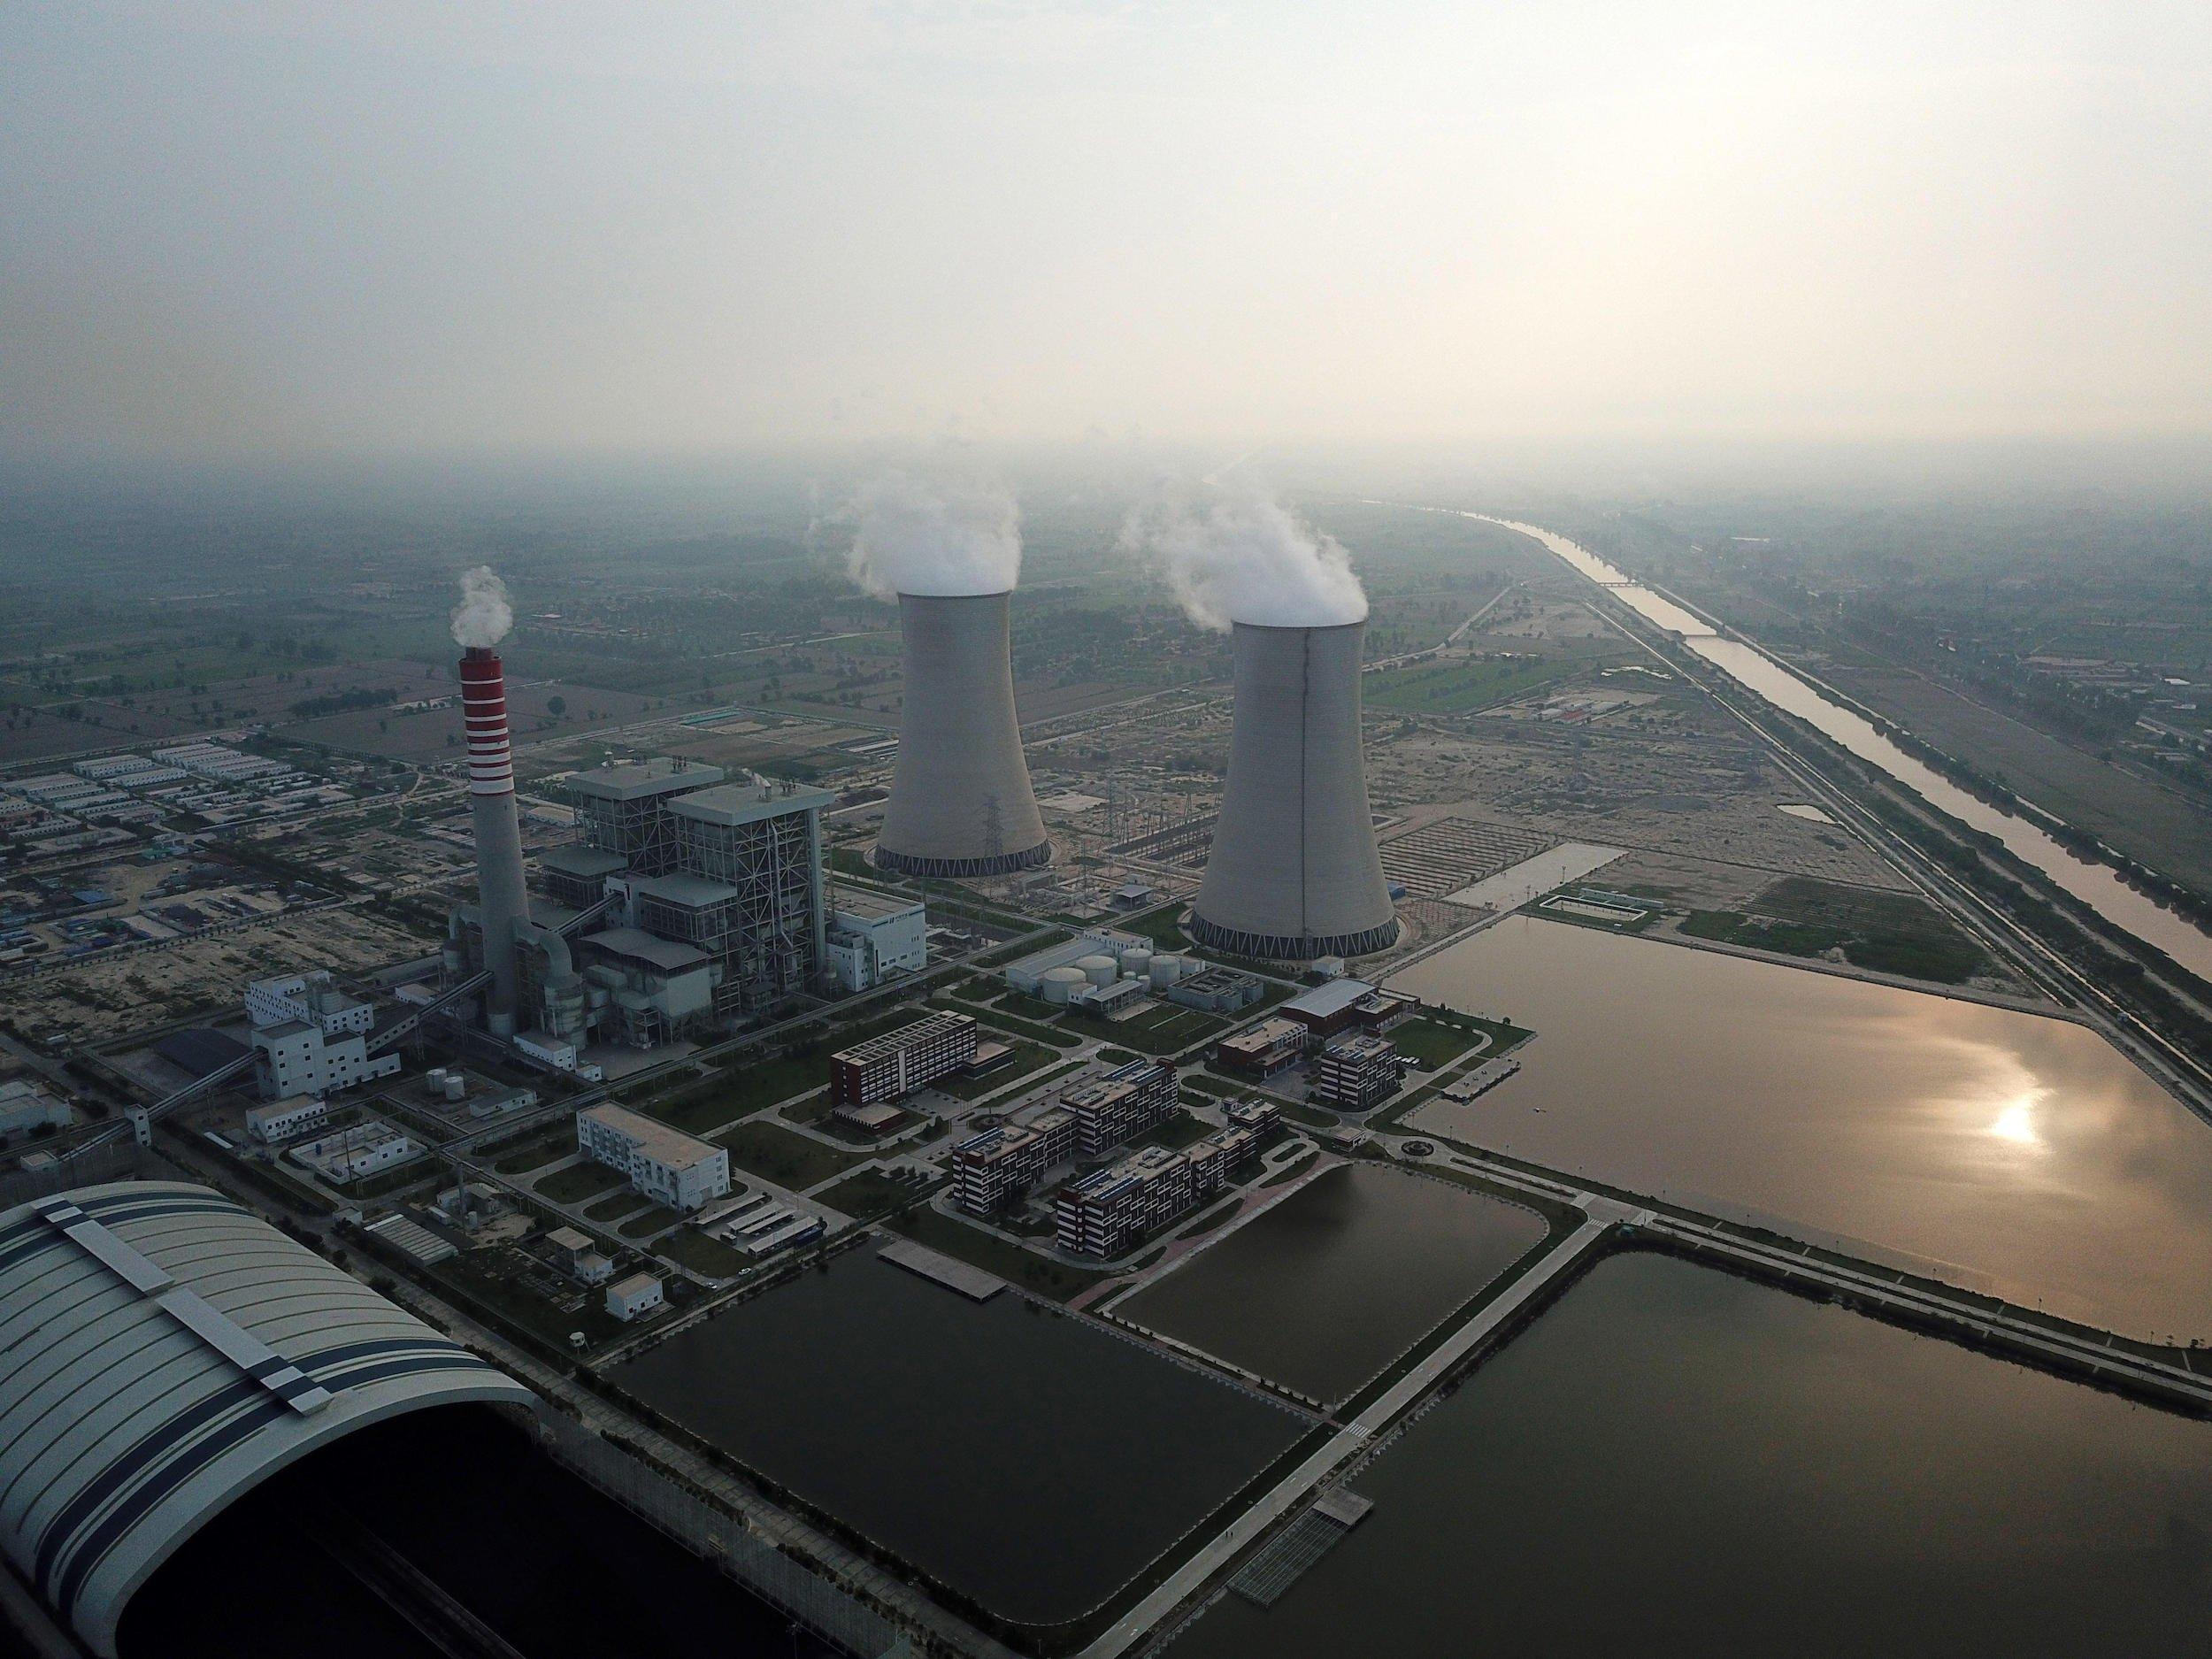 The Sahiwal coal power, built as part of the China-Pakistan Economic Corridor (Image: Alamy)